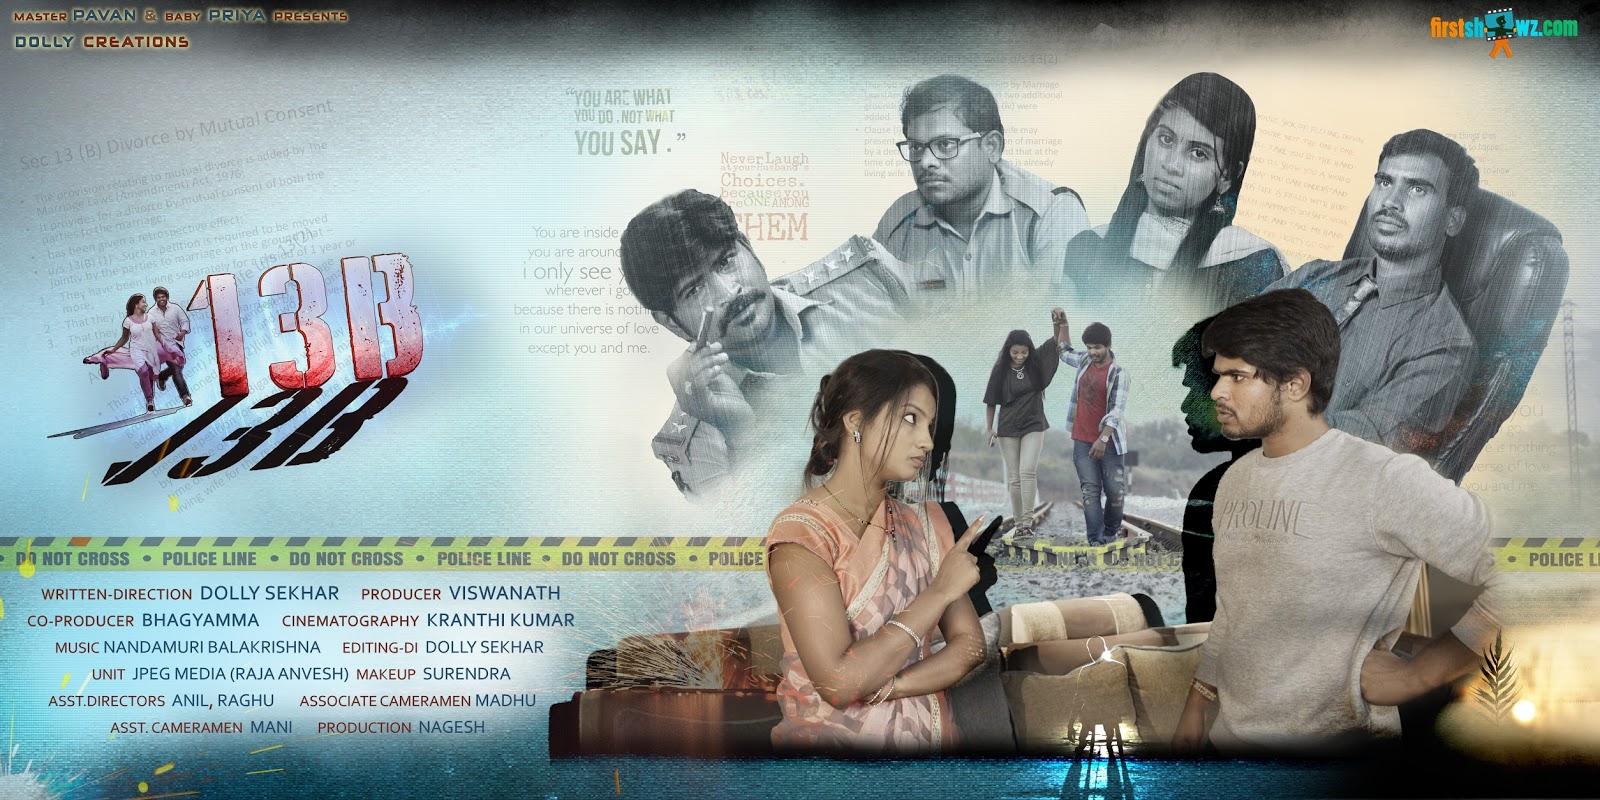 13 B Telugu Short Film Wallpapers Latest Movie Updates Movie Promotions Branding Online And Offline Digital Marketing Services